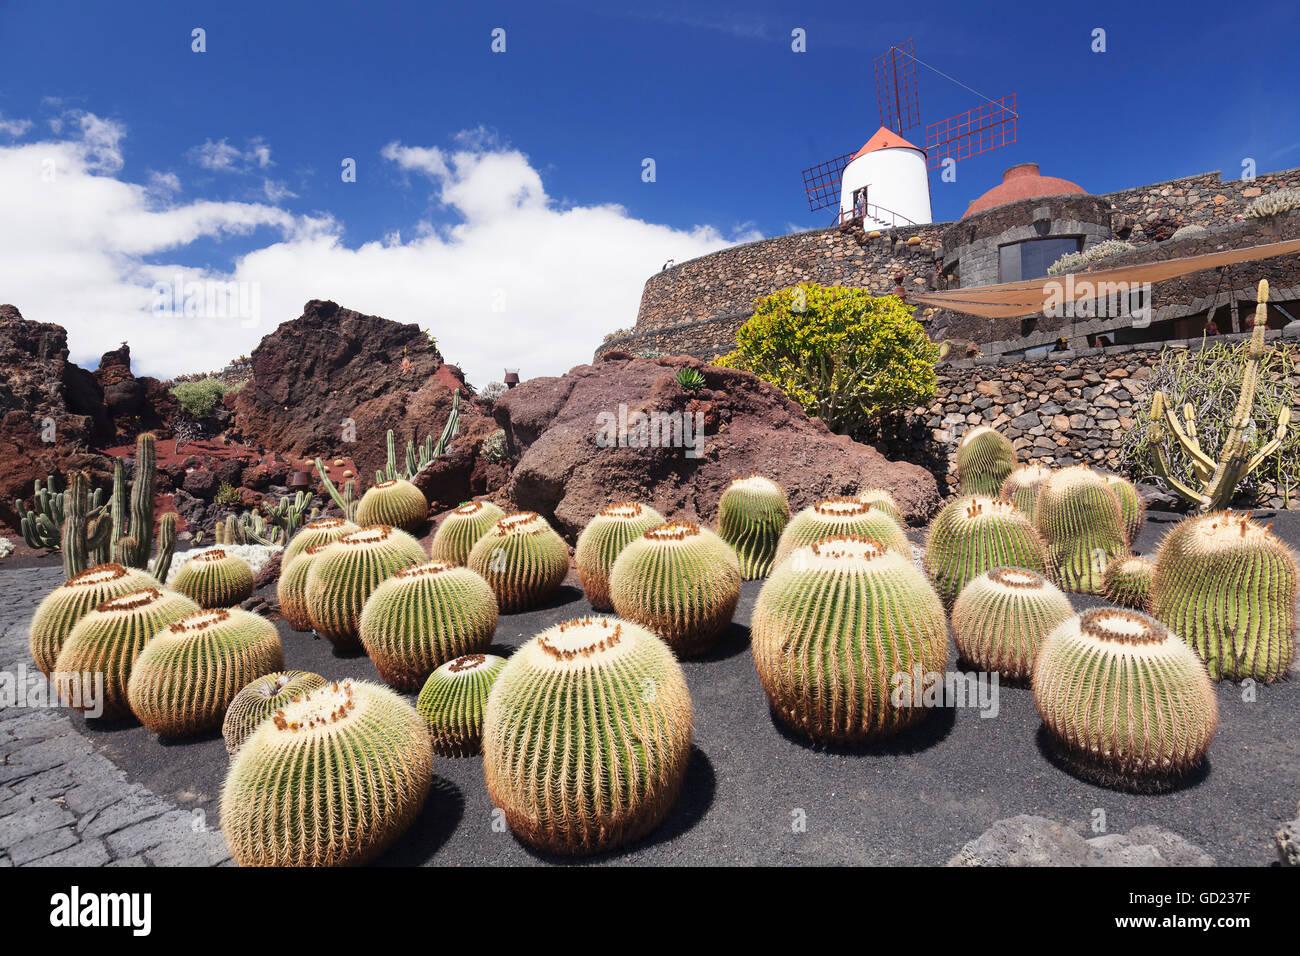 Cactus Garden Jardin De Cactus By Cesar Manrique Wind Mill Unesco